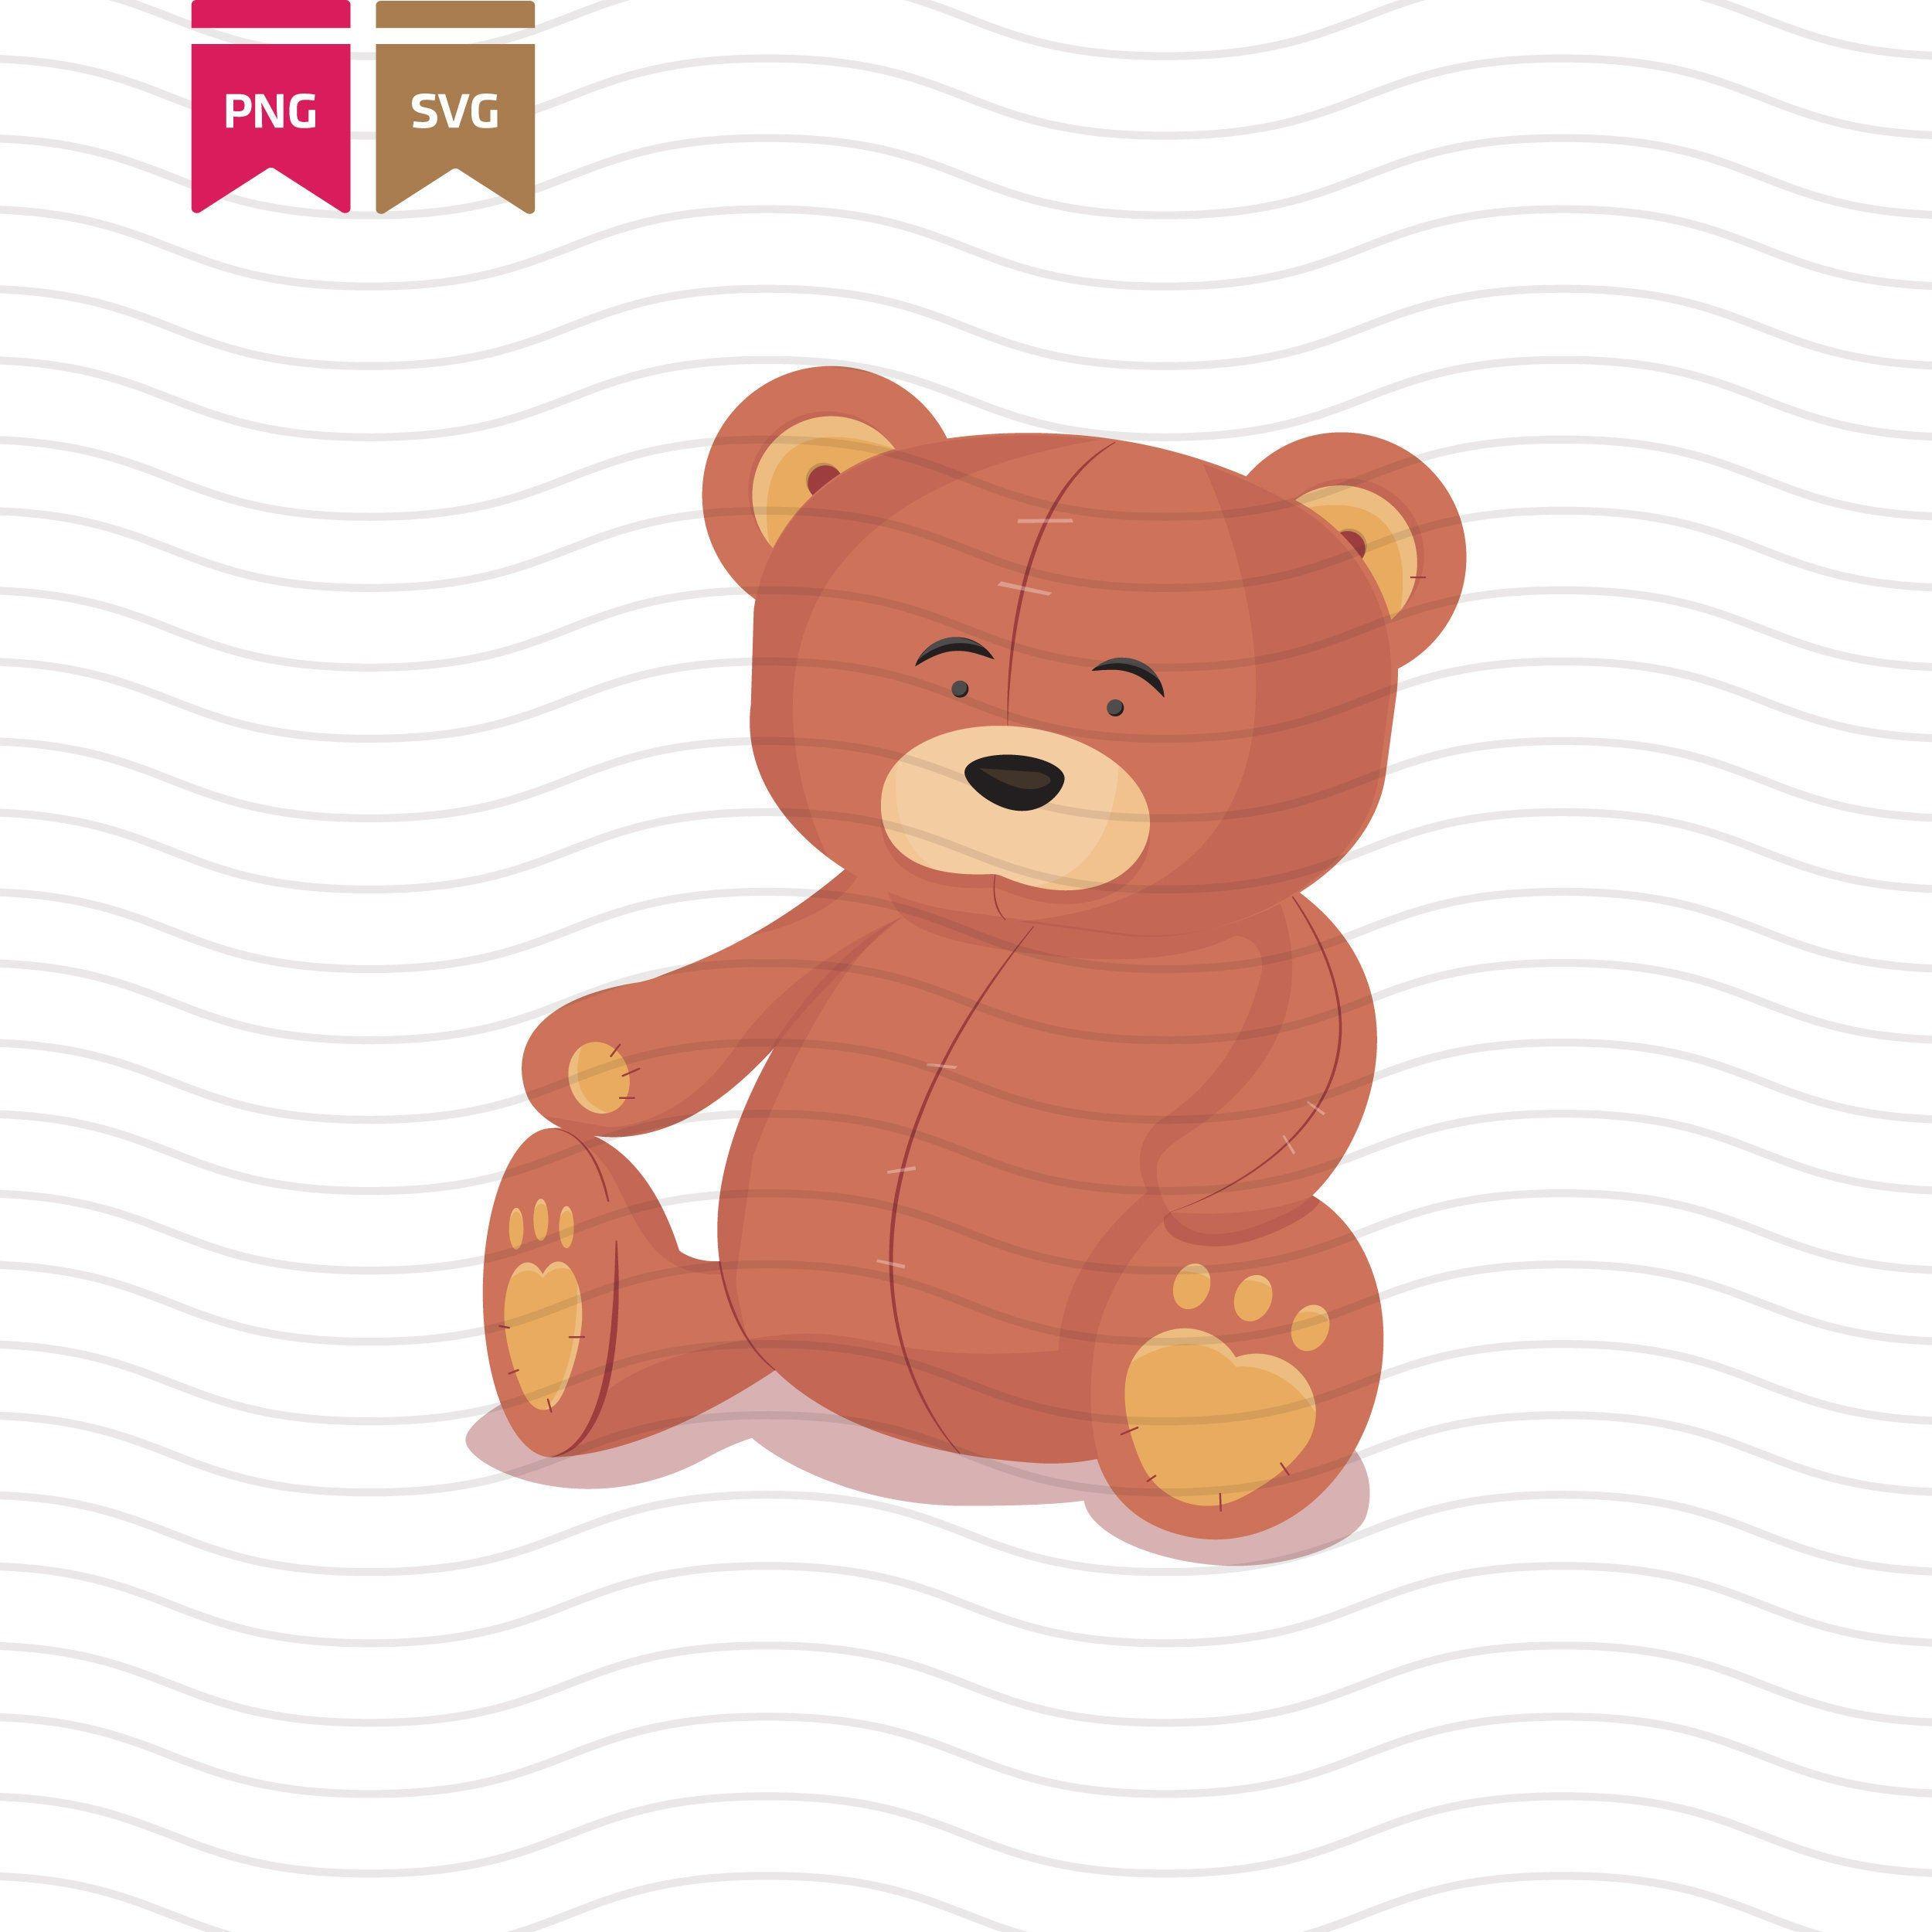 Cute Teddy Bear Svg Teddy Bear Printable Art Instant Etsy In 2021 Bear Illustration Svg Teddy Bear